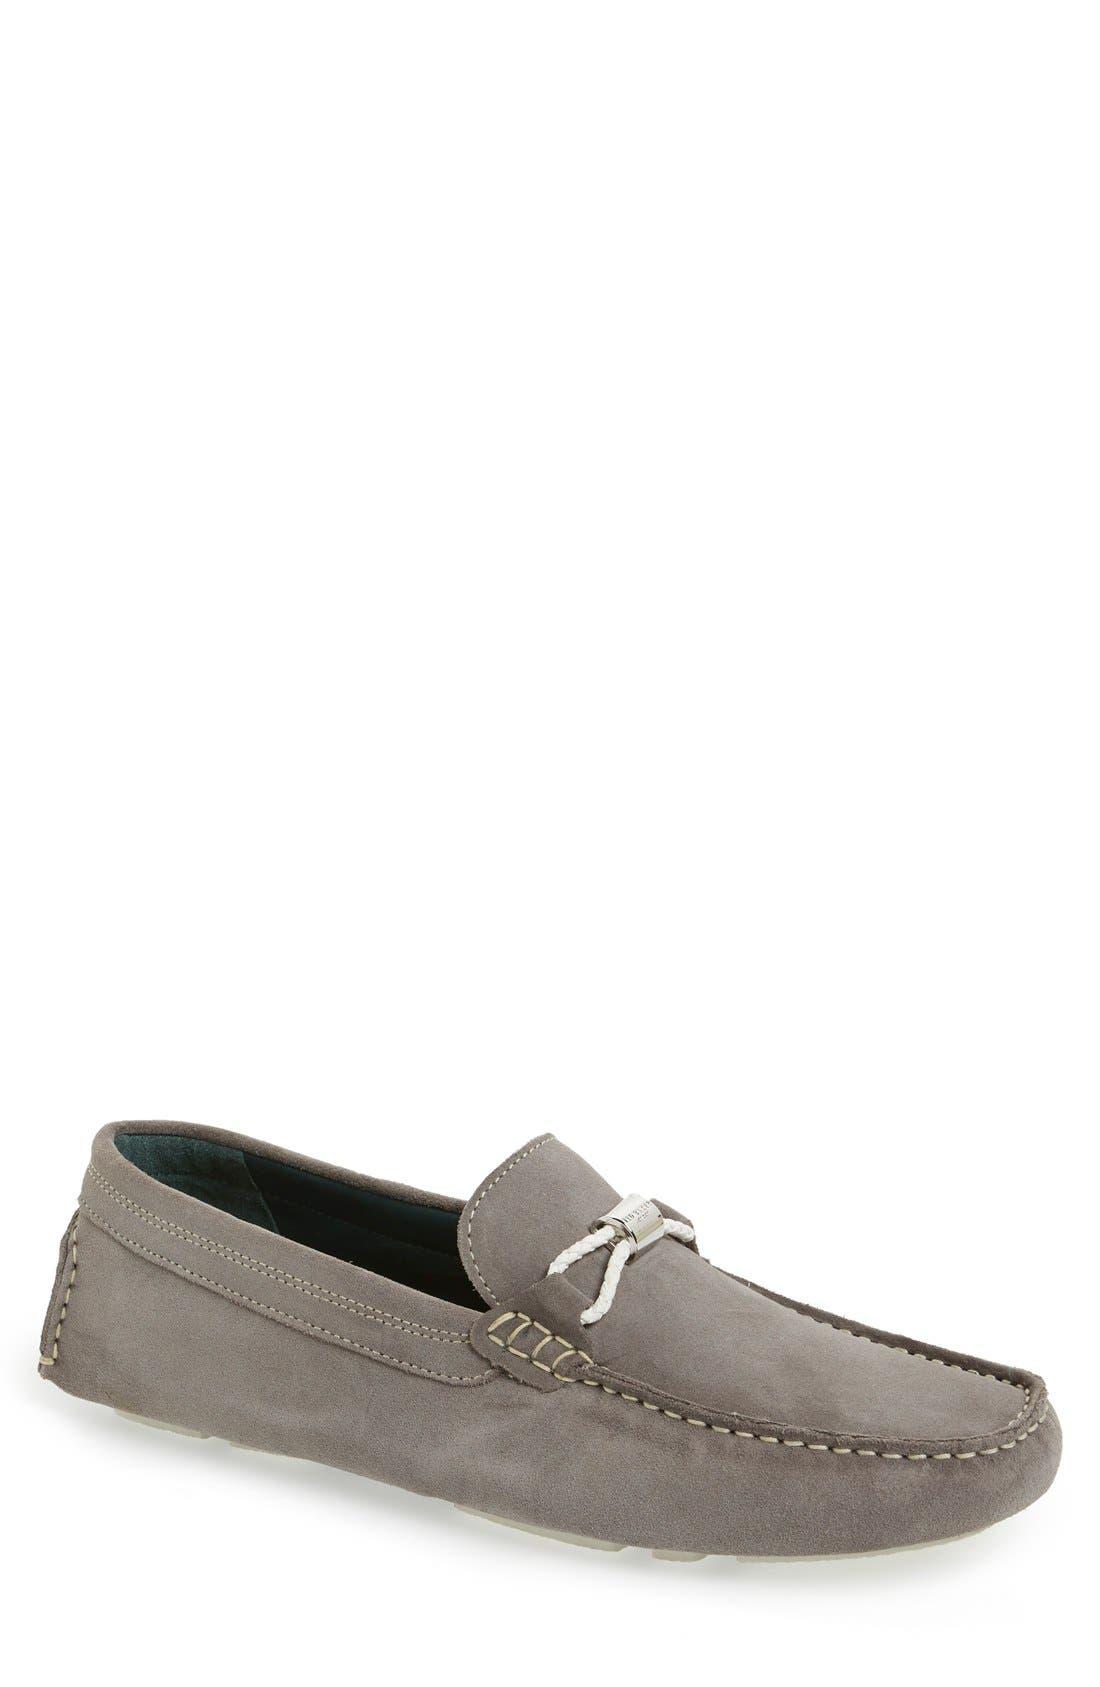 'Carlsun 2' Driving Shoe,                         Main,                         color, 052